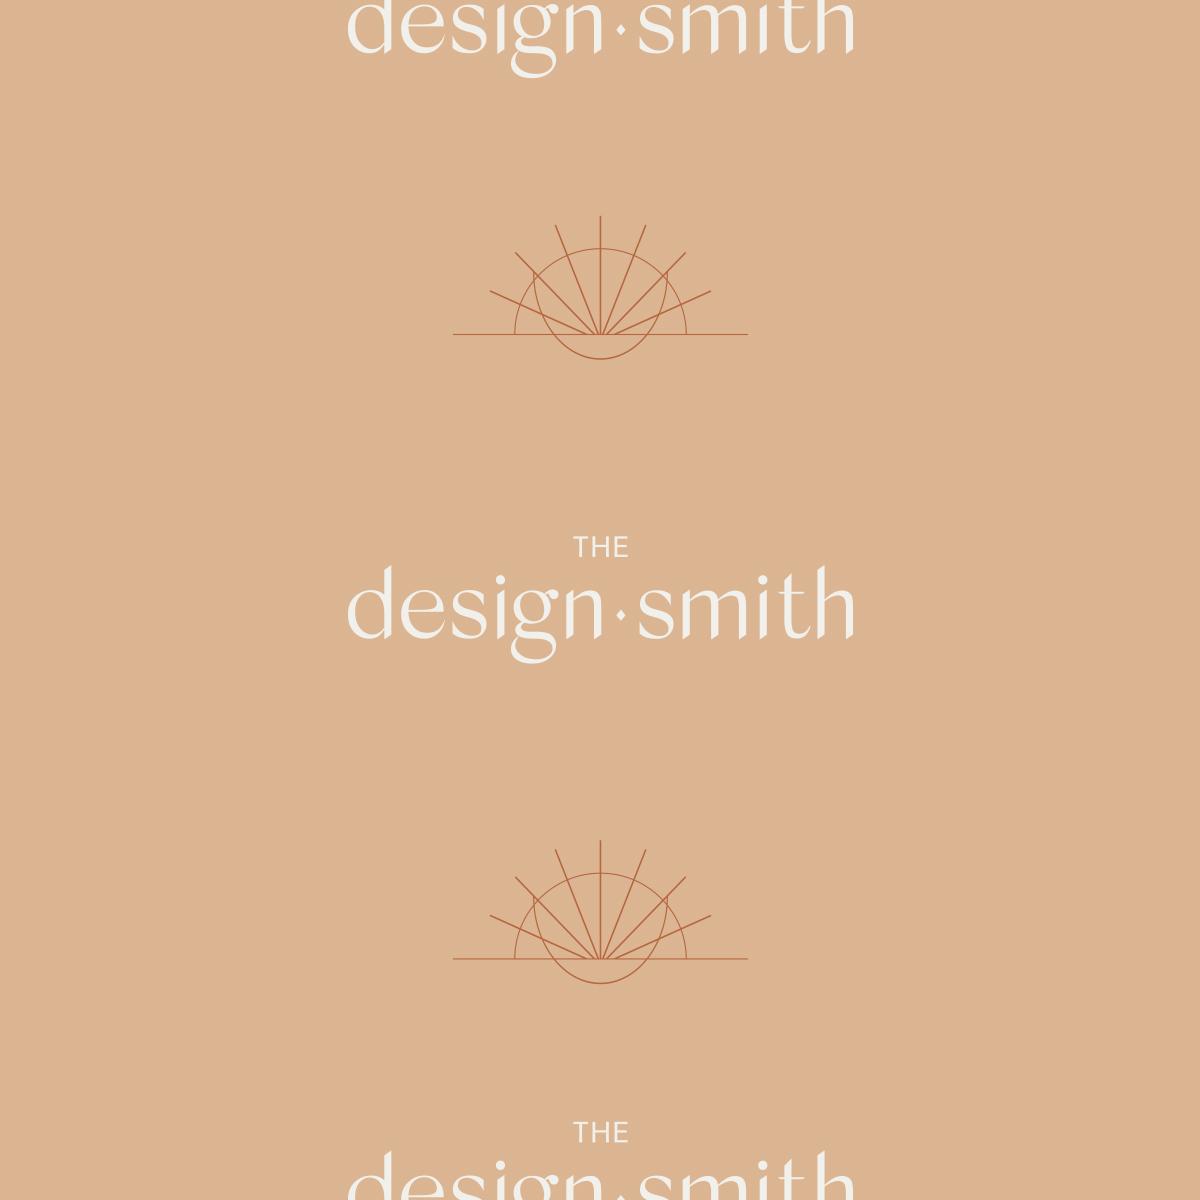 the-design-smith-byron-bay-interior-designer-branding.jpg